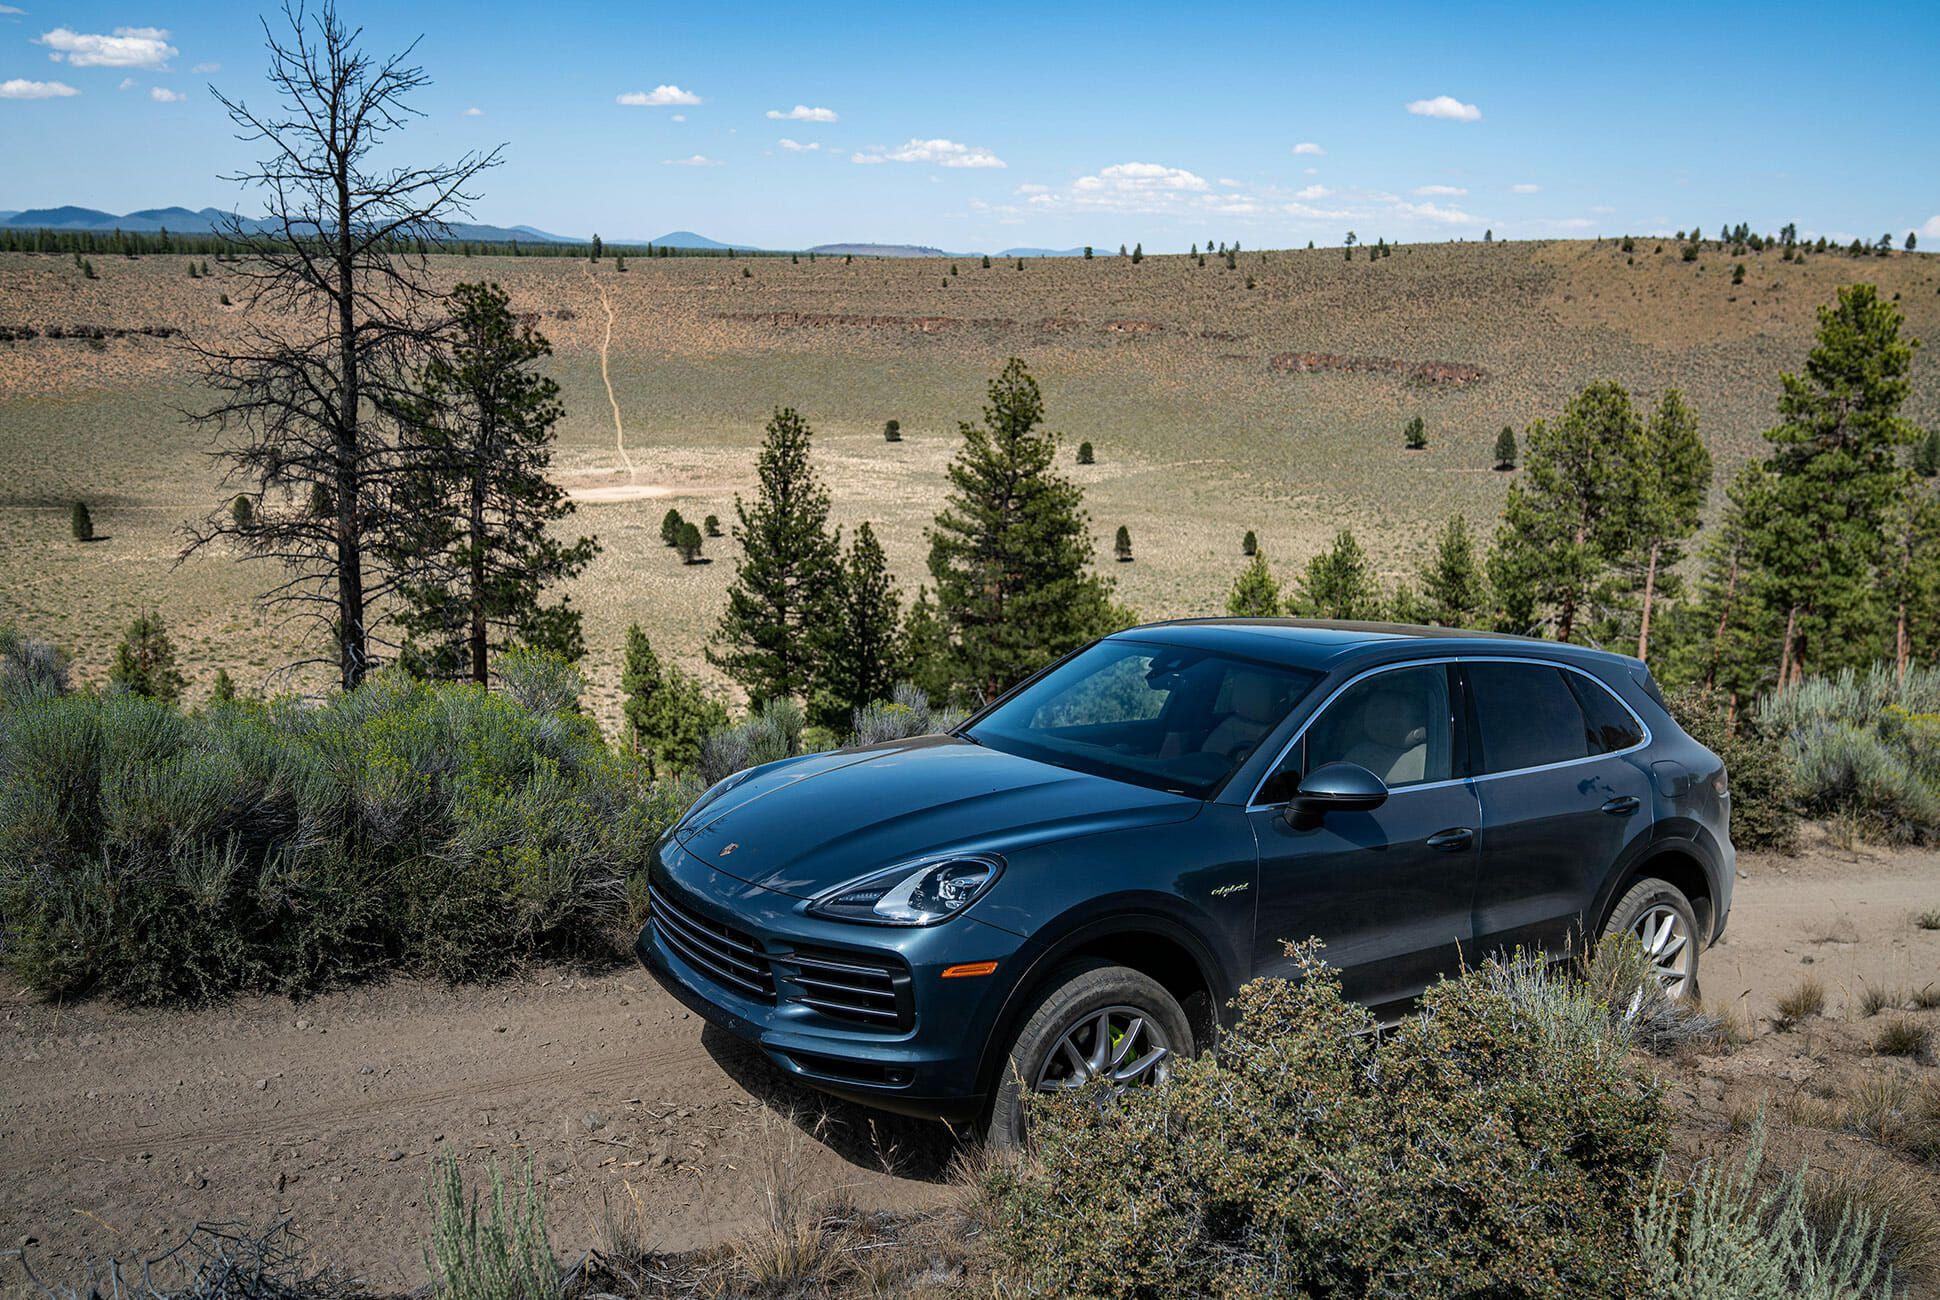 Pair-of-High-Tech-Porsche-Cayenne-Hybrids-gear-patrol-Hole-ambience-3